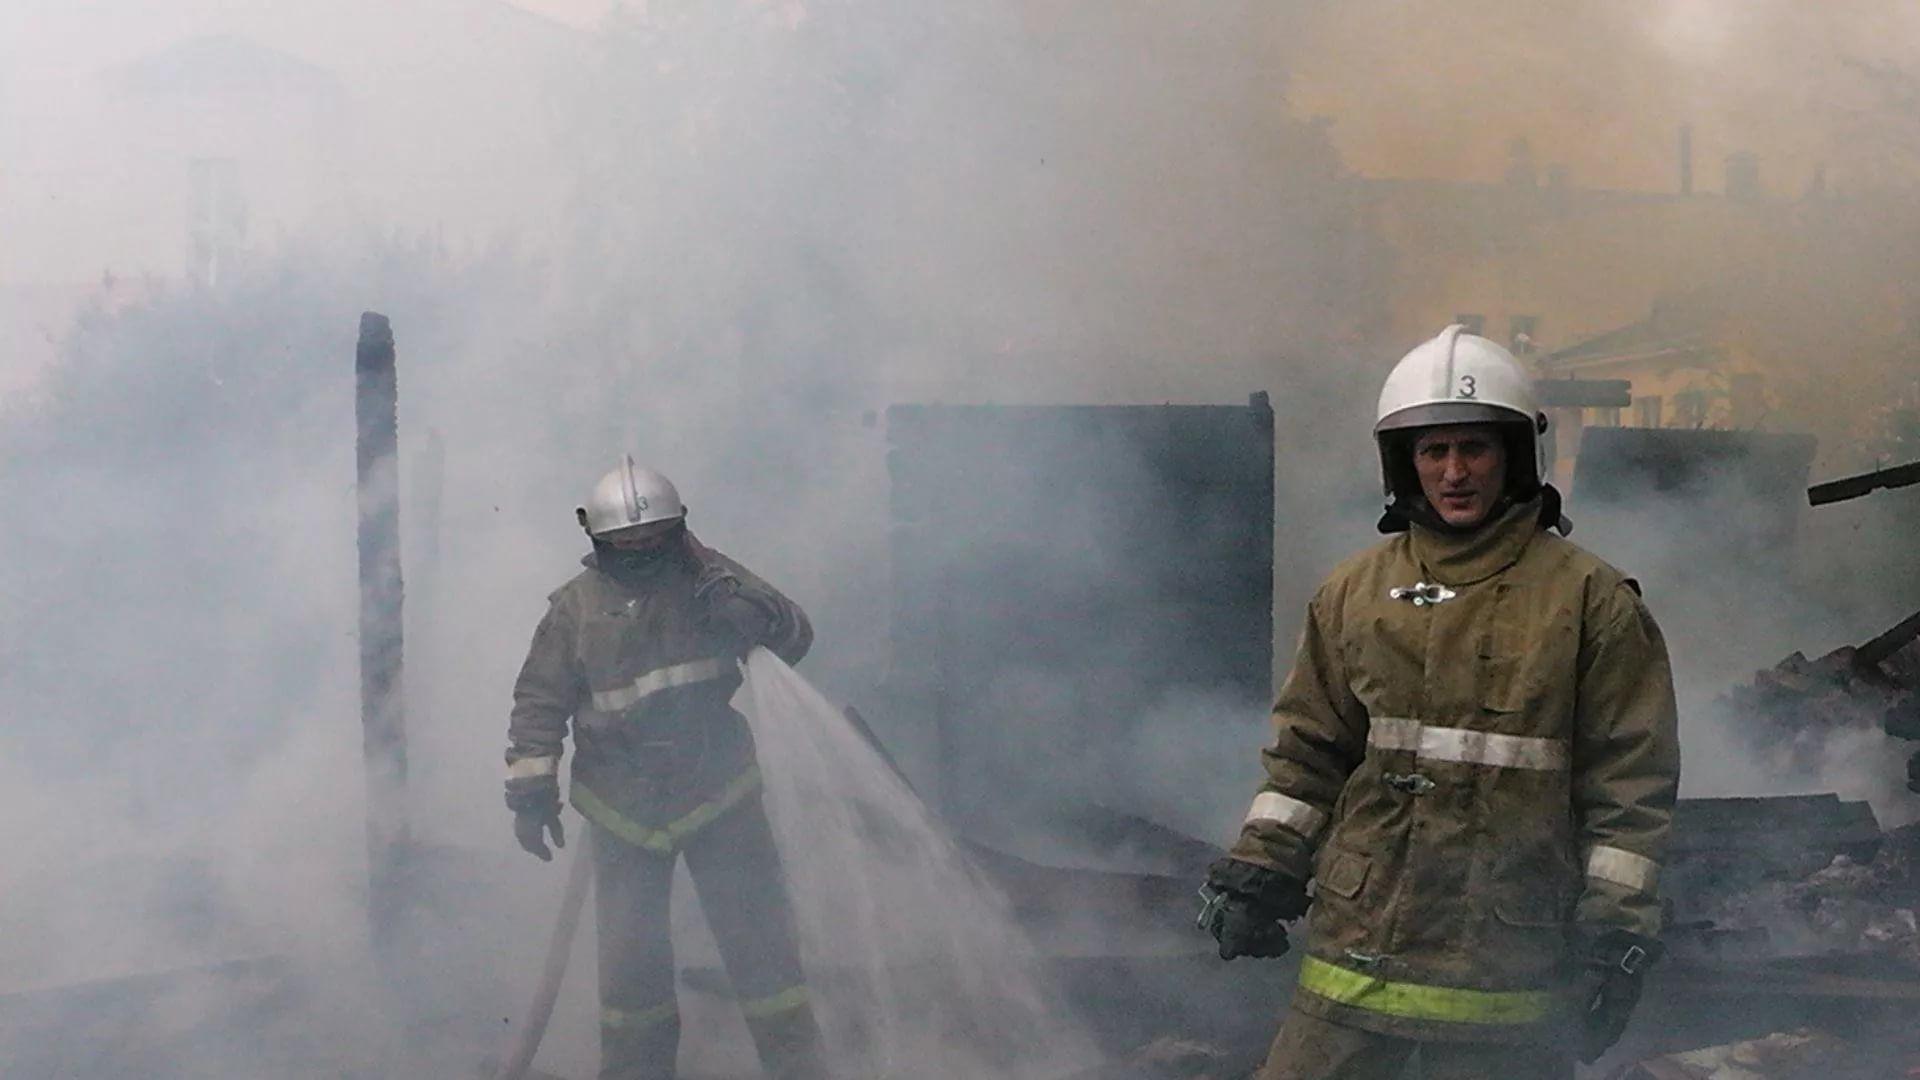 Firefighter full screen hd wallpaper